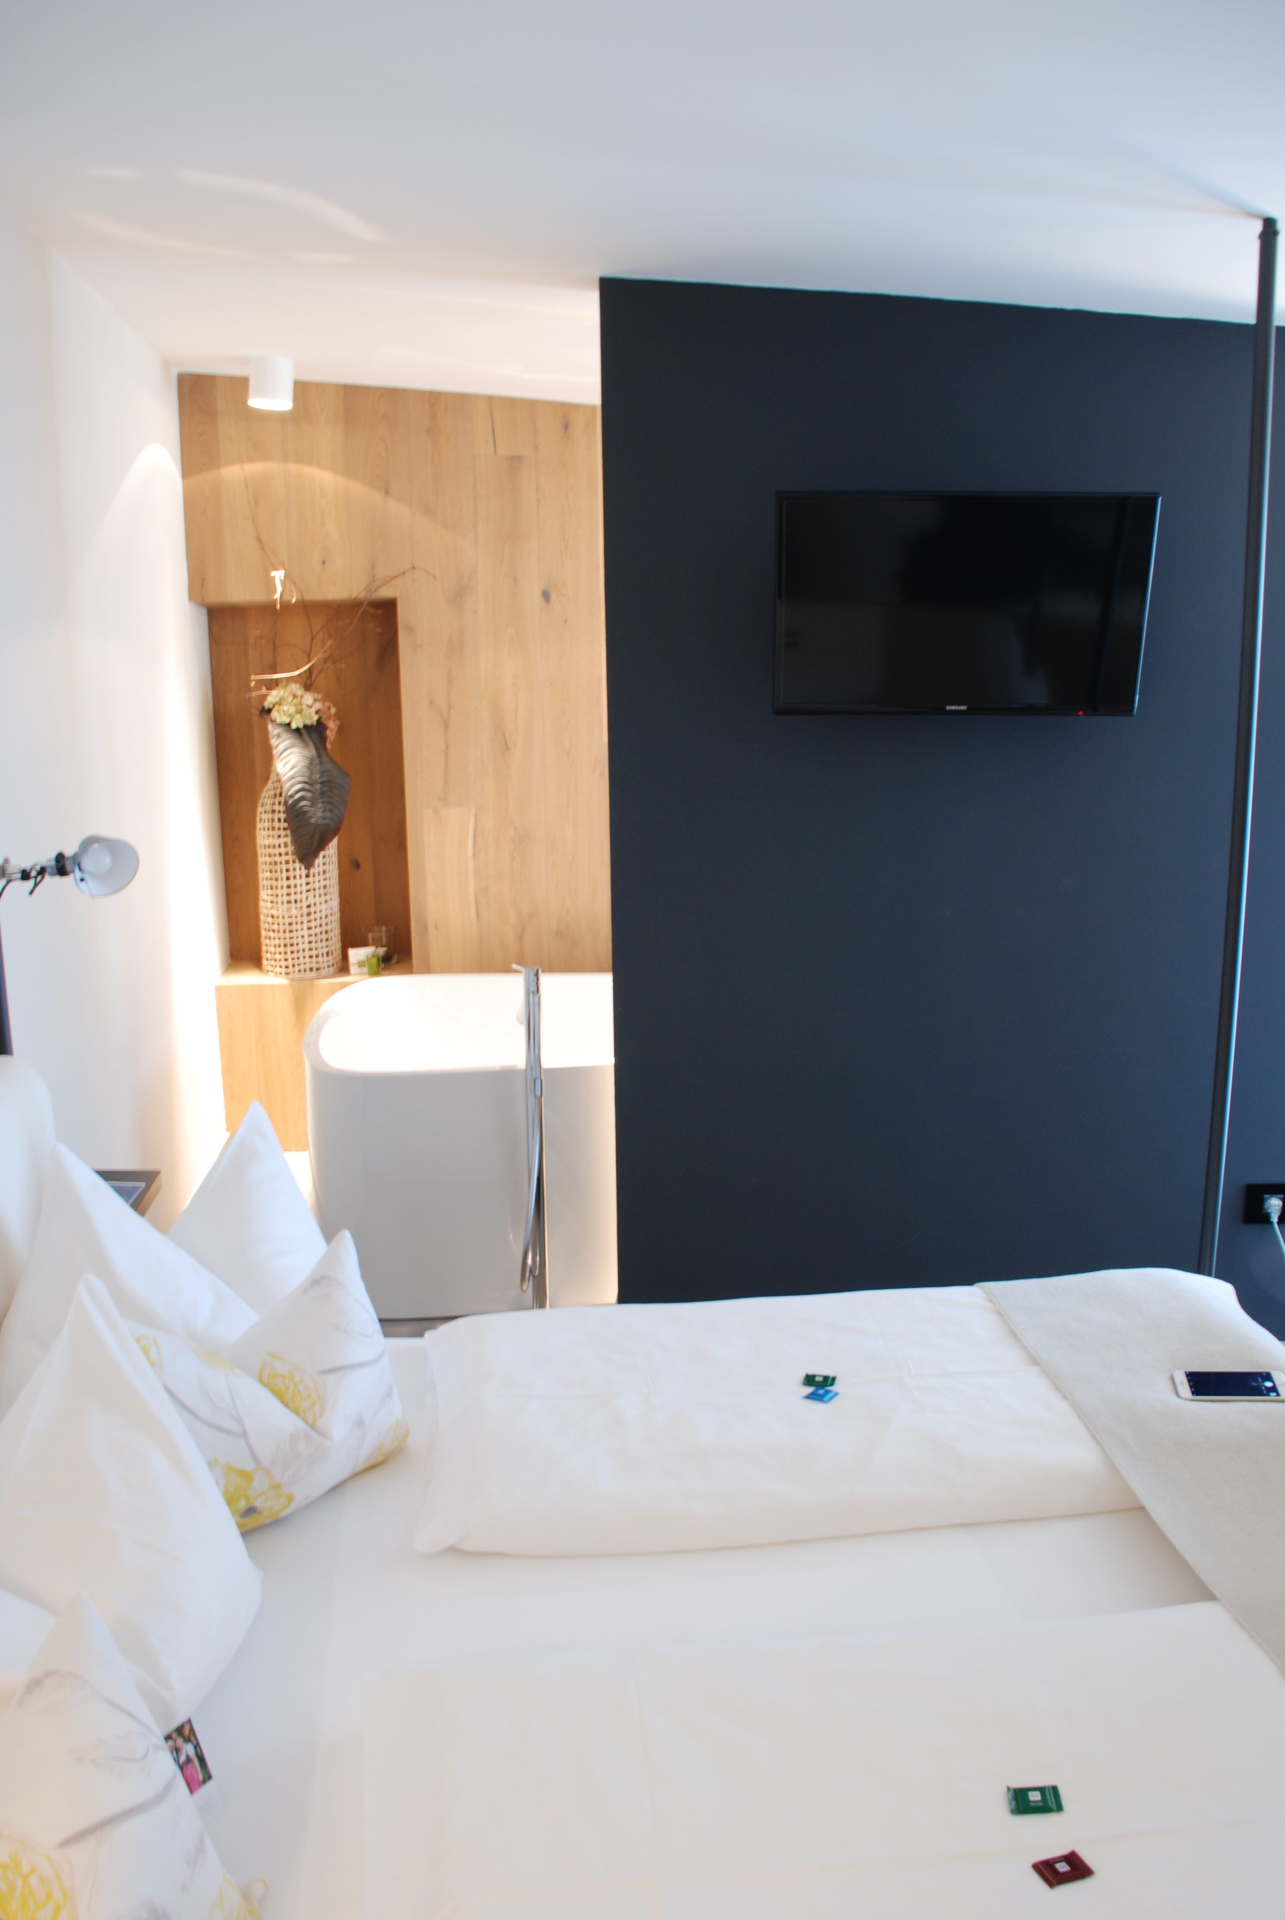 Weekend Dolomiti: fuga romantica al Post Hotel San Candido